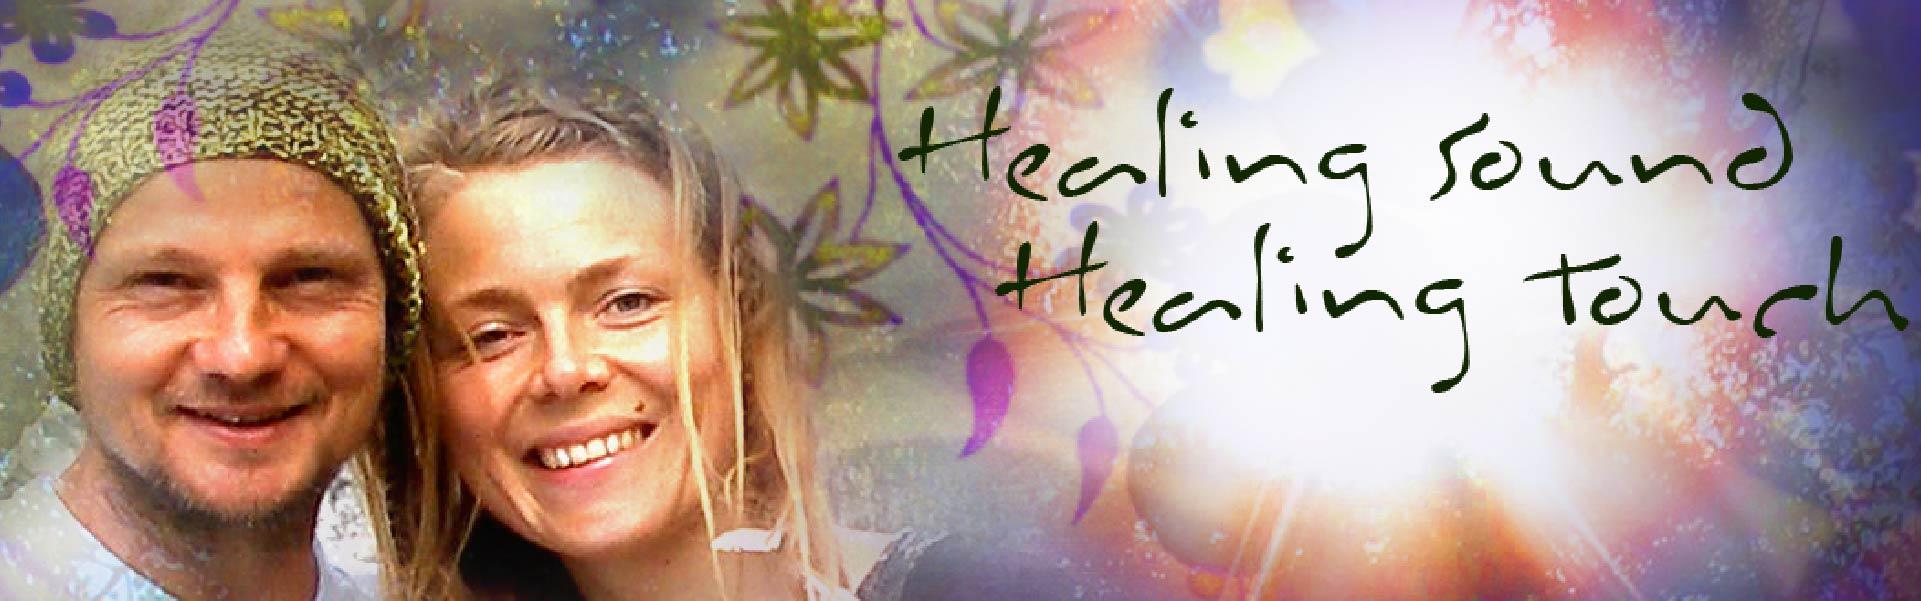 Praful Vimal Healing Sound Healing Touch HeartFire Tobacco Theater